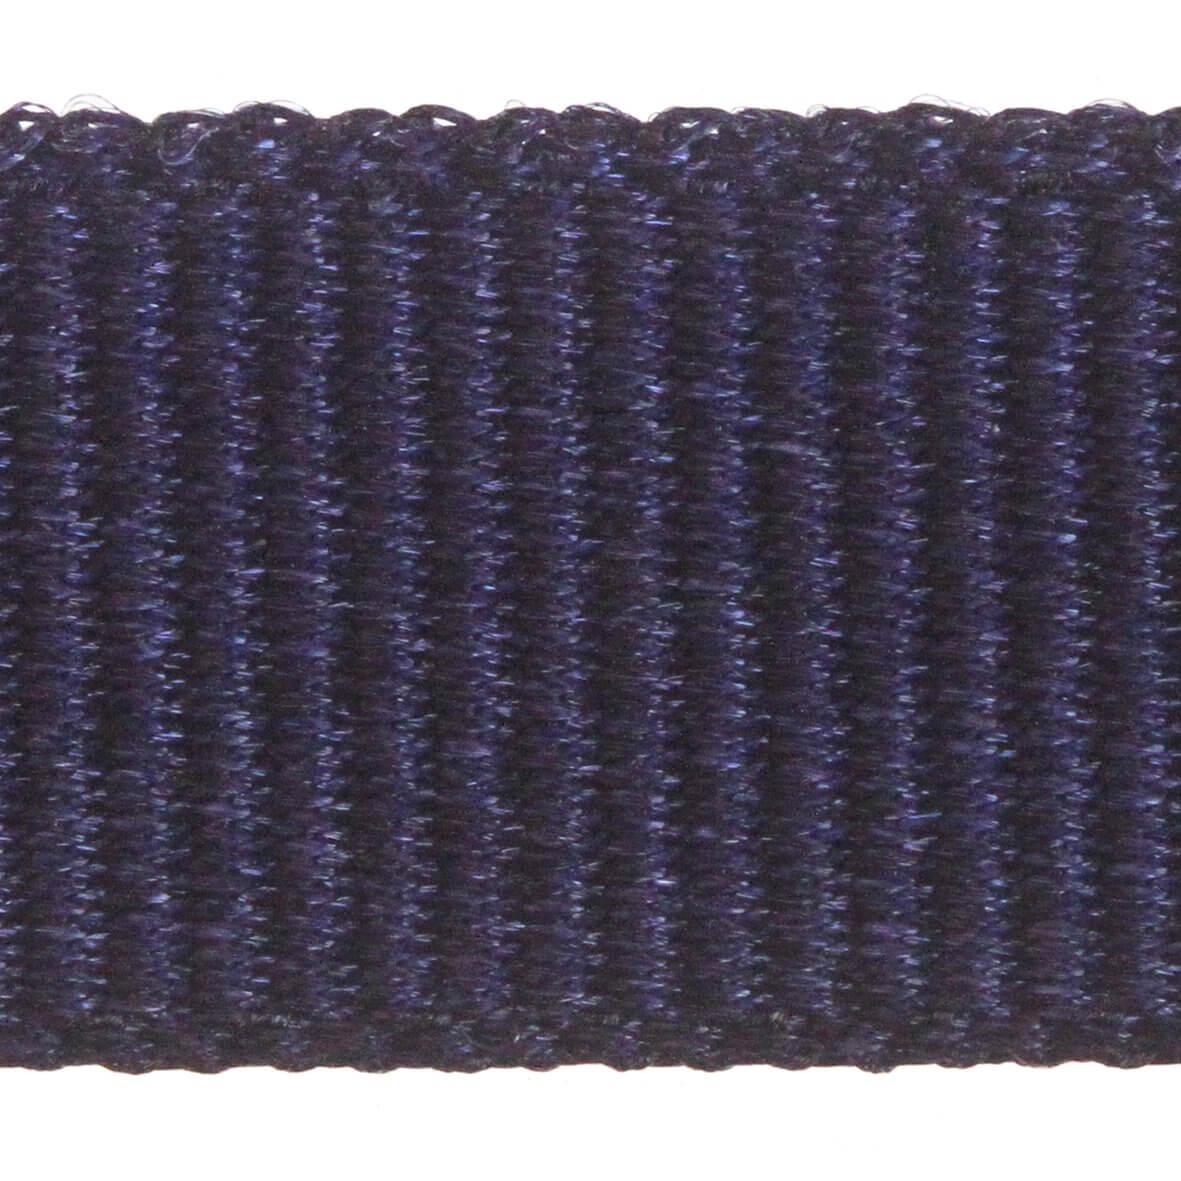 Berisfords Grosgrain 6mm Ribbon - Navy Colour 9590 - Zoom